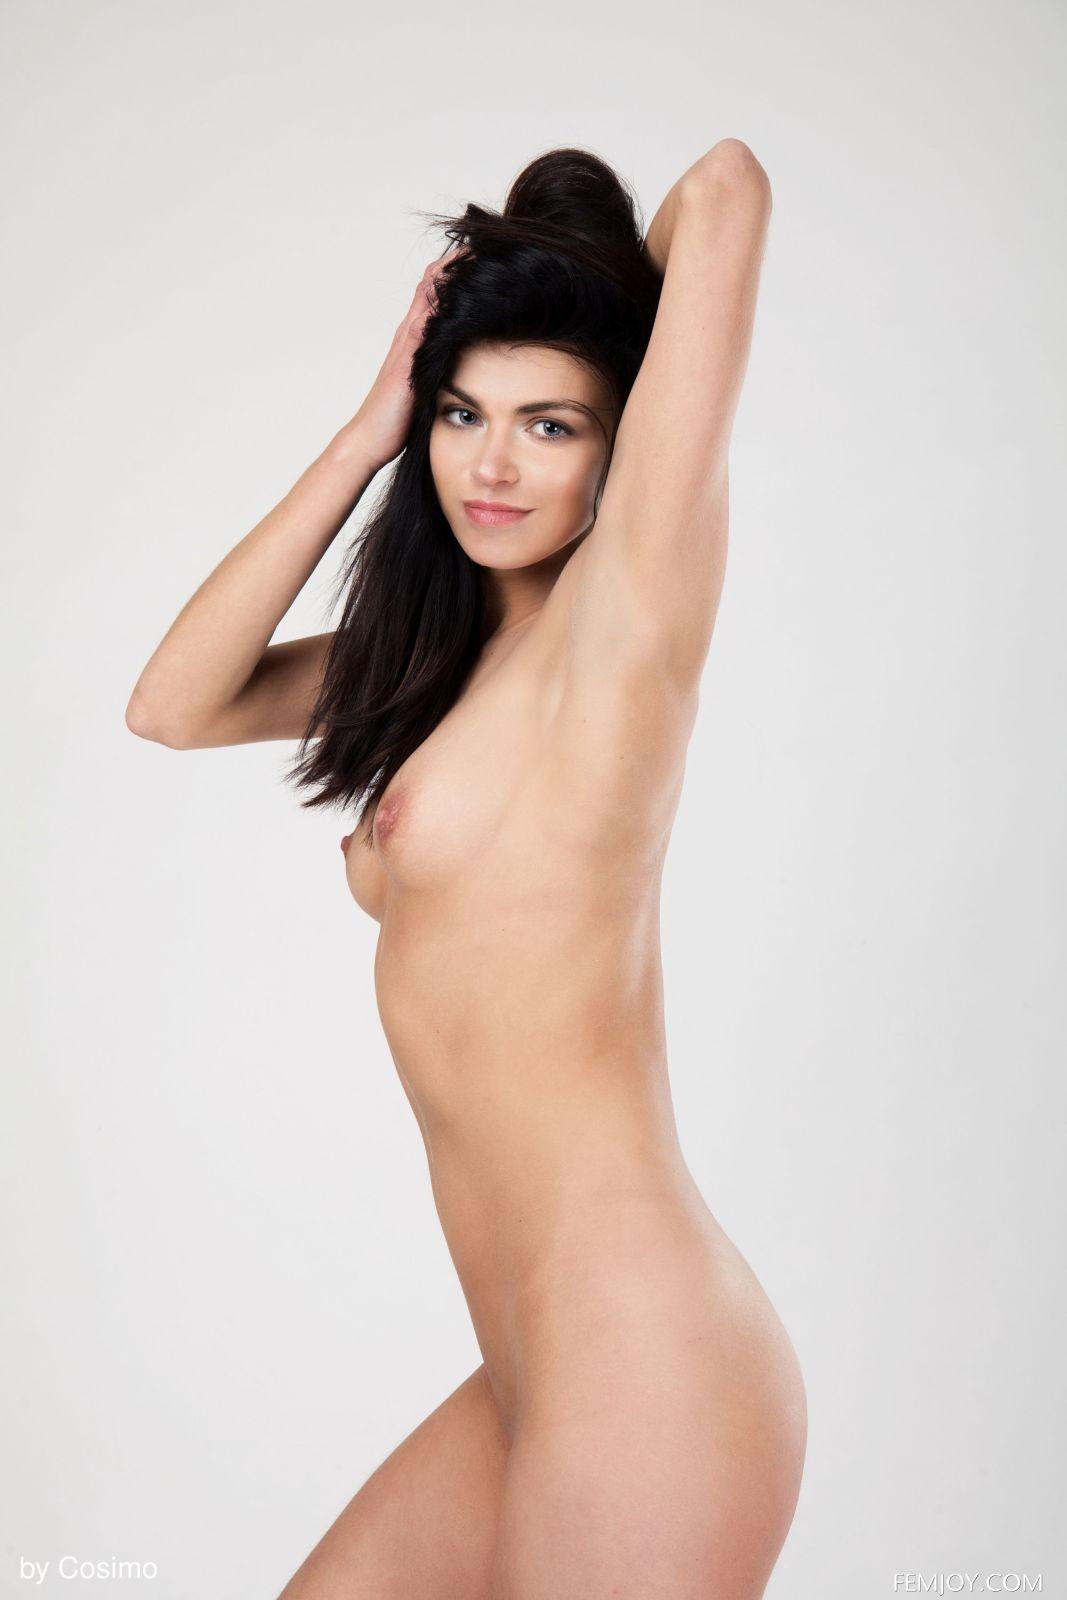 Брюнетка с широкими плечами - фото